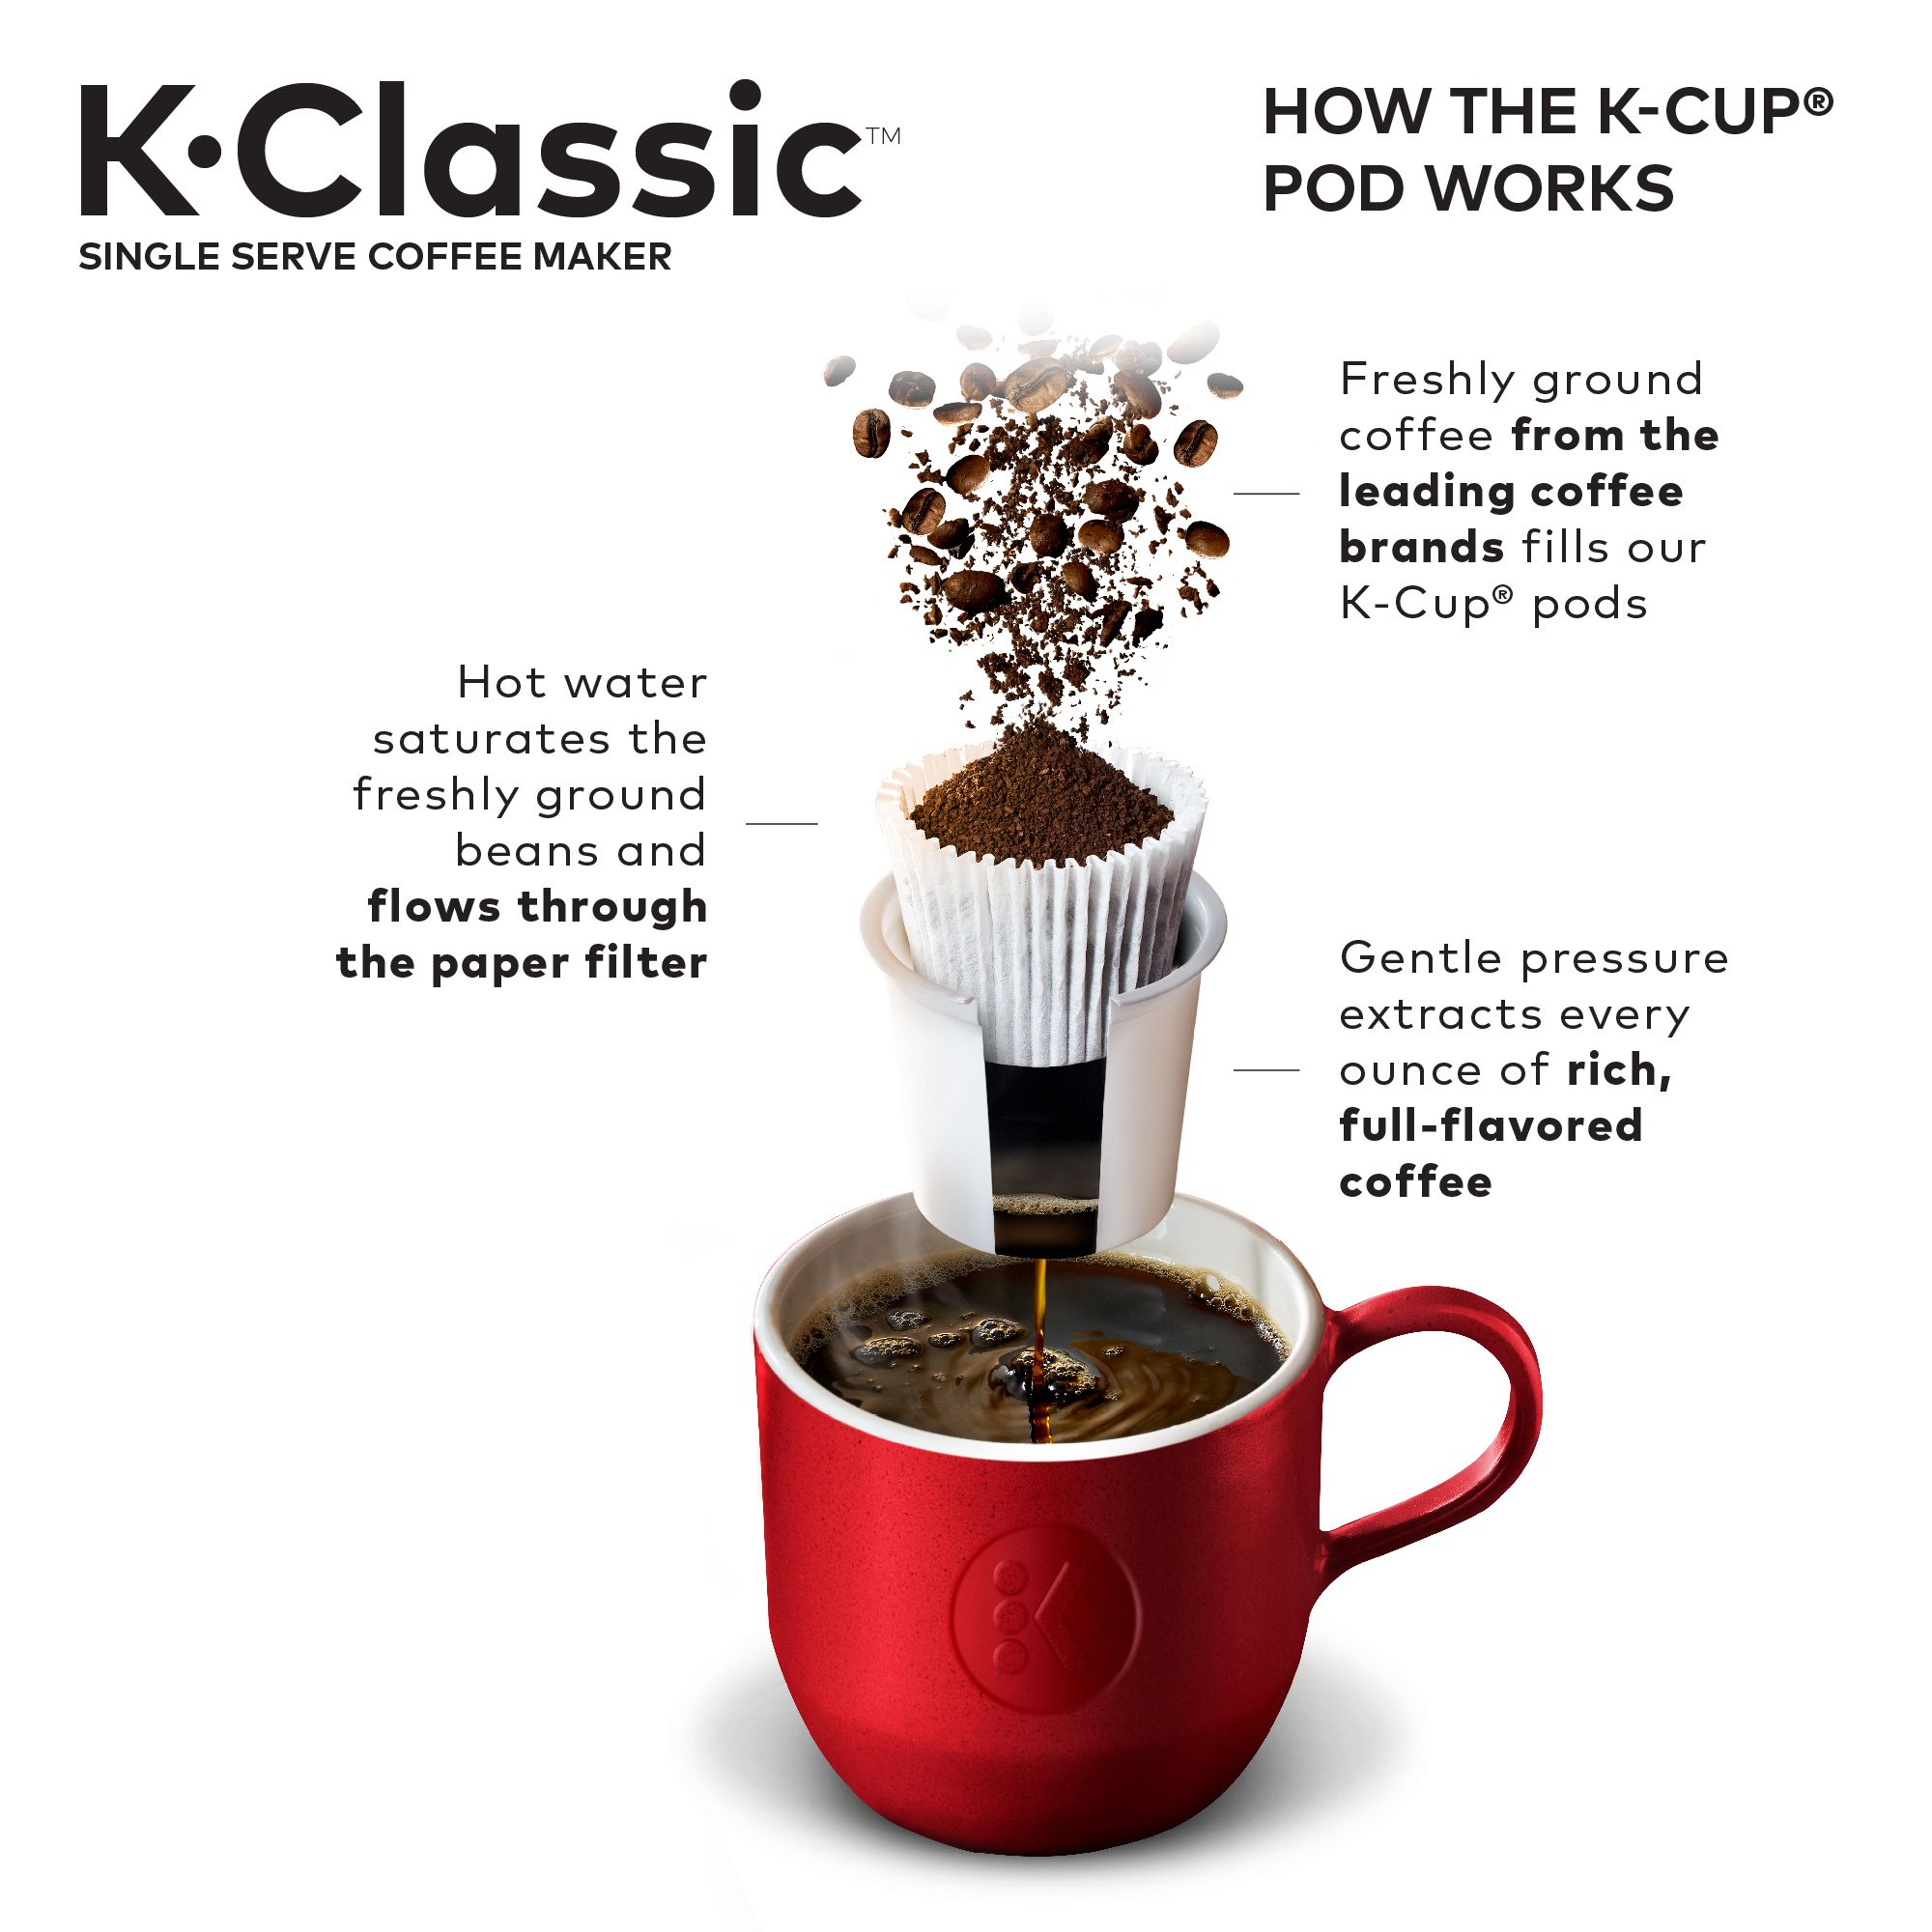 Keurig KClassic K50 Single Serve, KCup Pod Coffee Maker